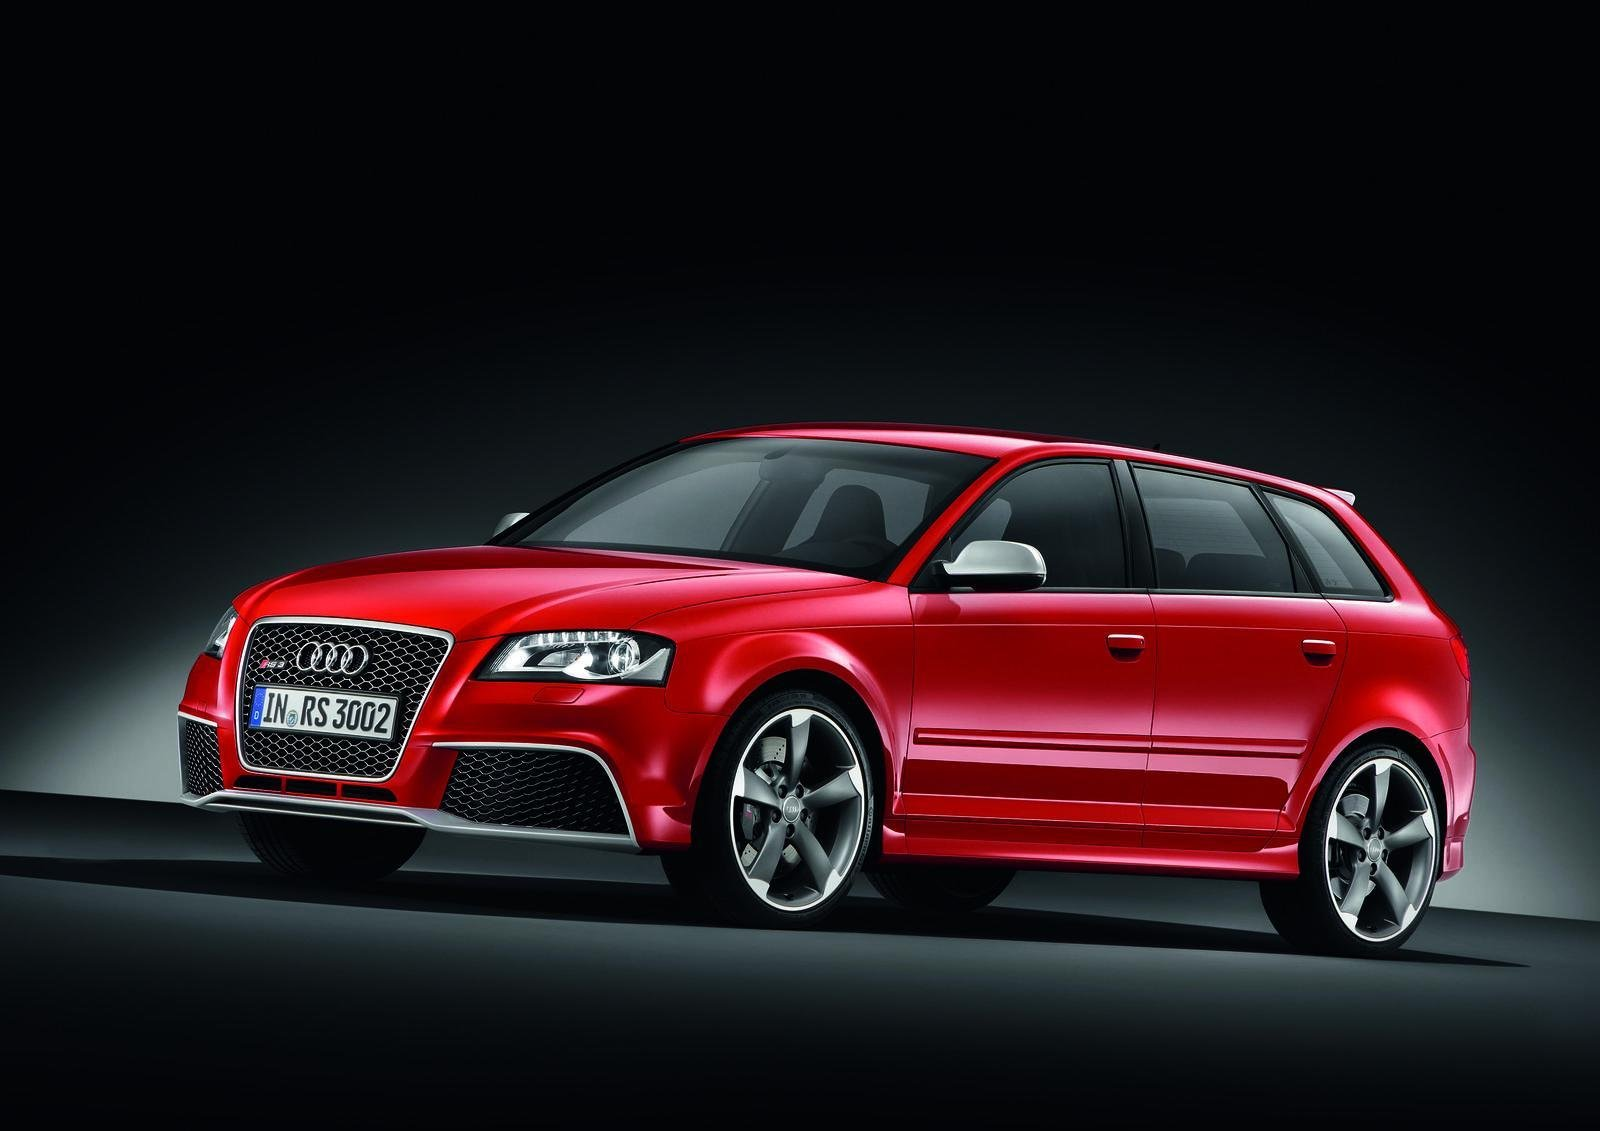 Audi RS 3 I 2011 - 2012 Hatchback 5 door #2